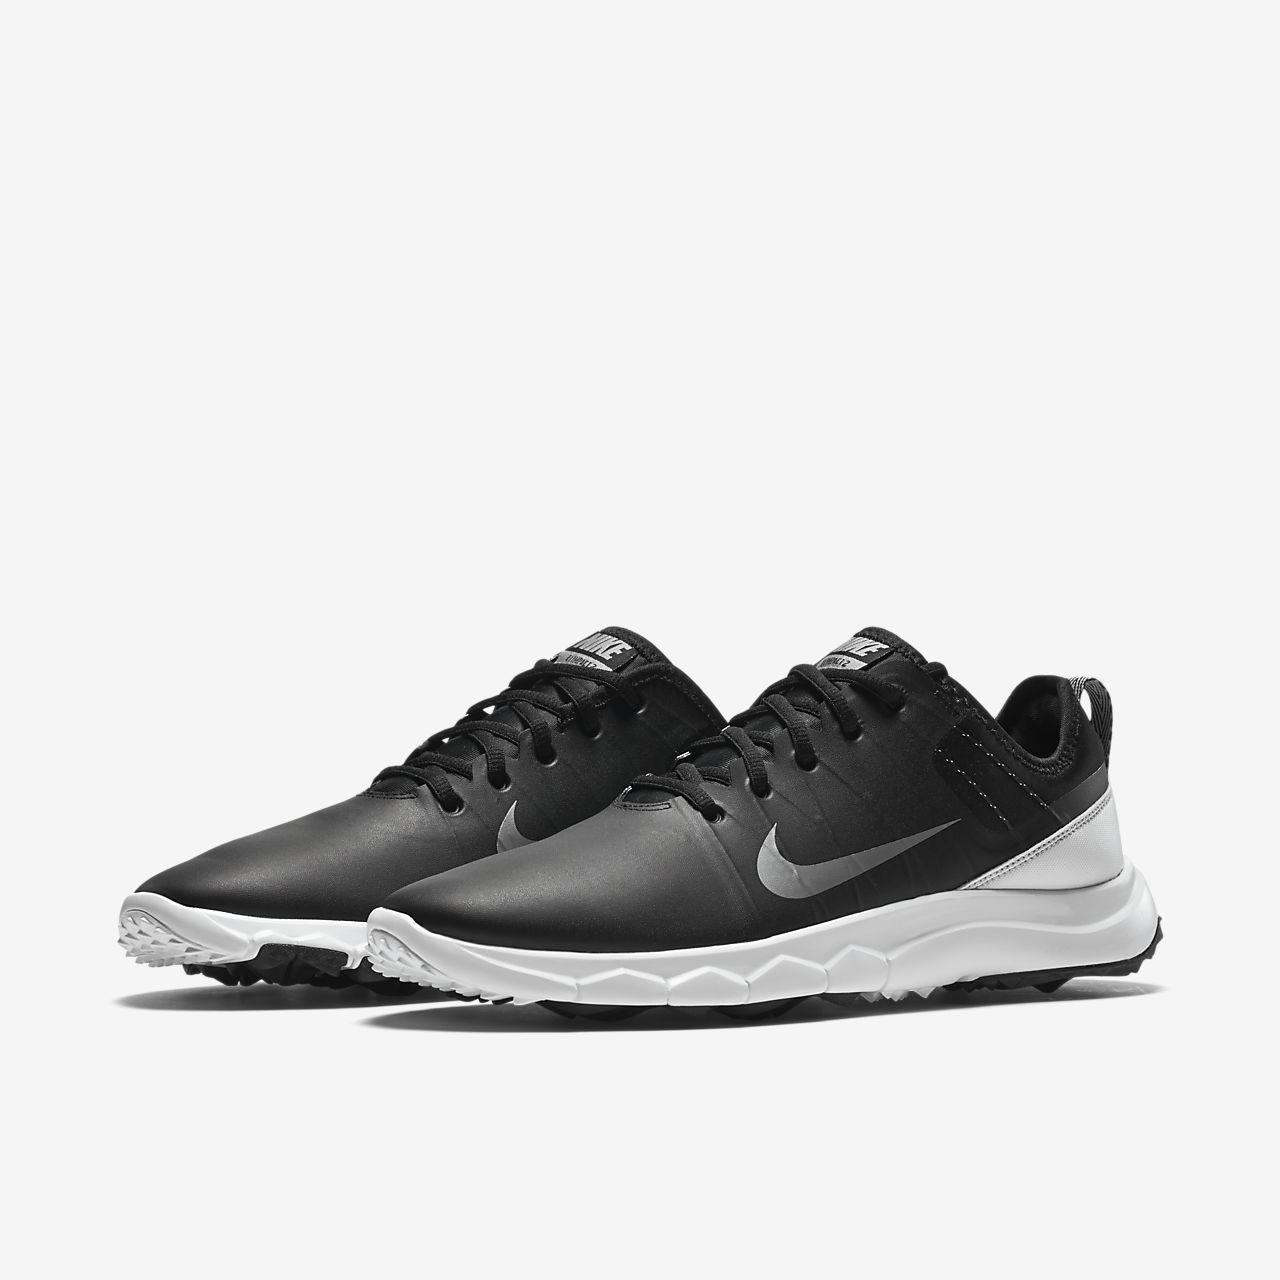 new arrival daeb1 c2cf1 ... Golfsko Nike FI Impact 2 för kvinnor